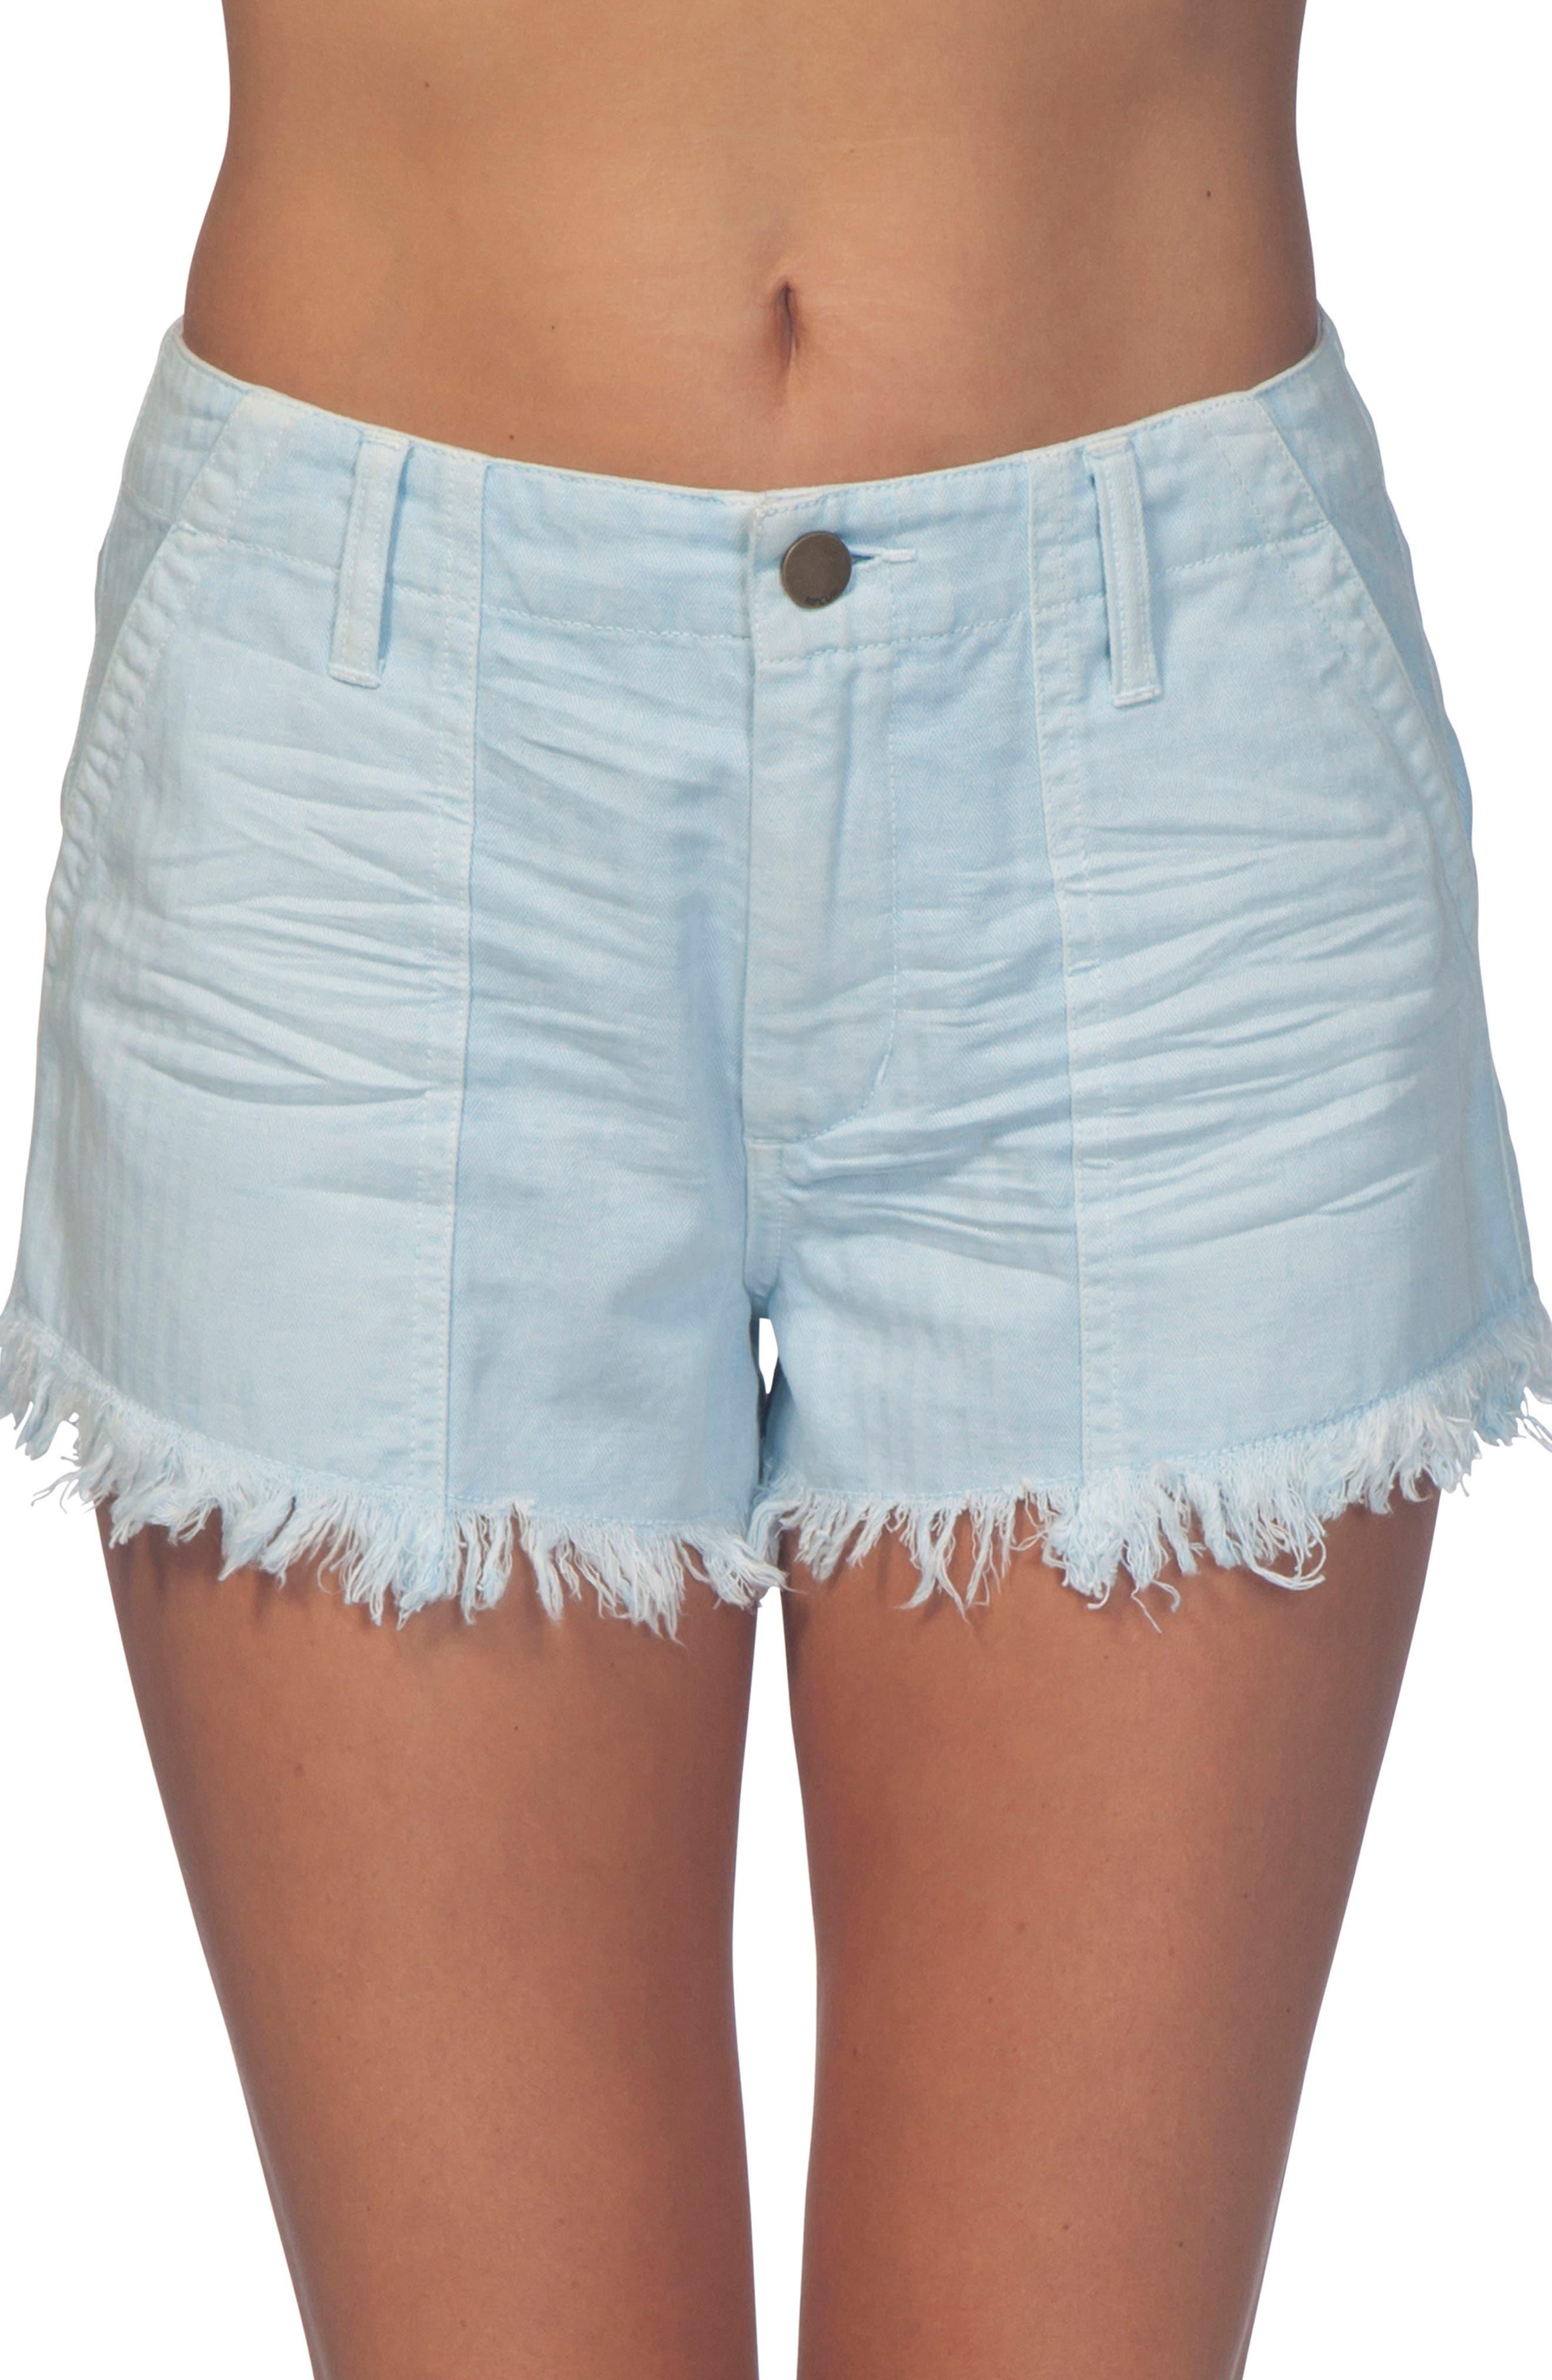 Vista Cutoff Denim Shorts,                         Main,                         color, Light Blue